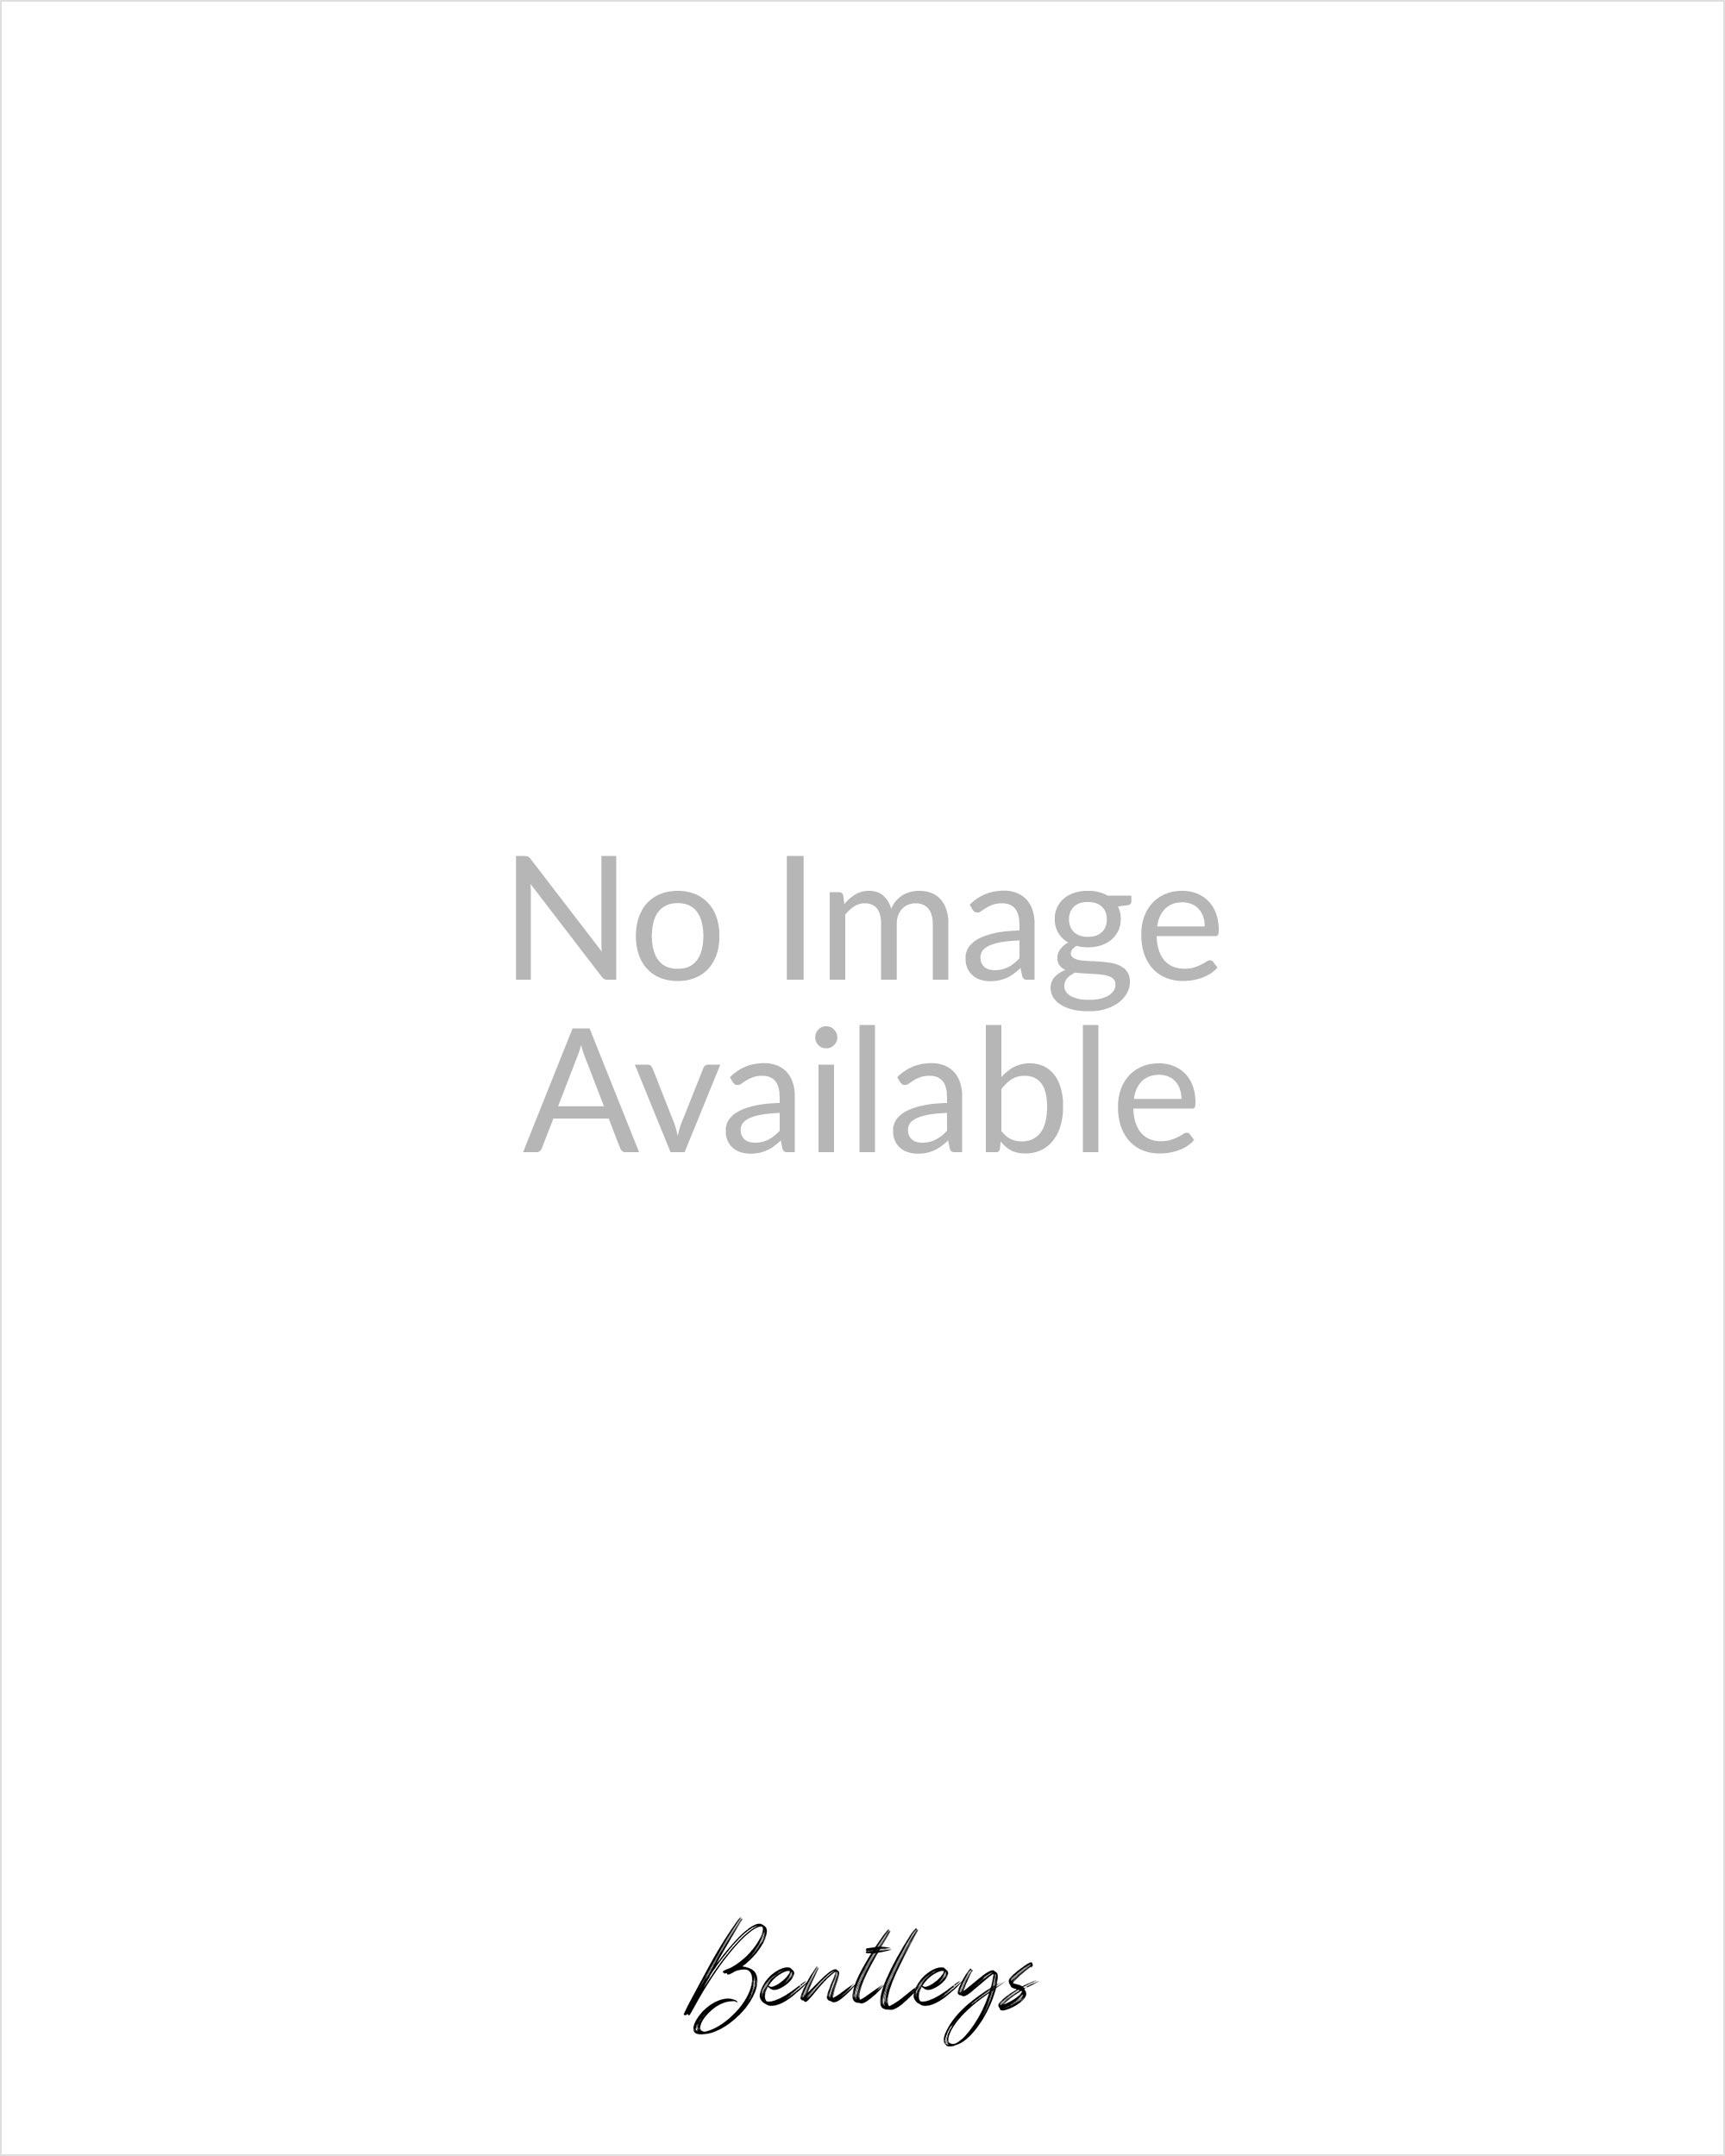 Joseph Ribkoff Black//White Top Style 191139